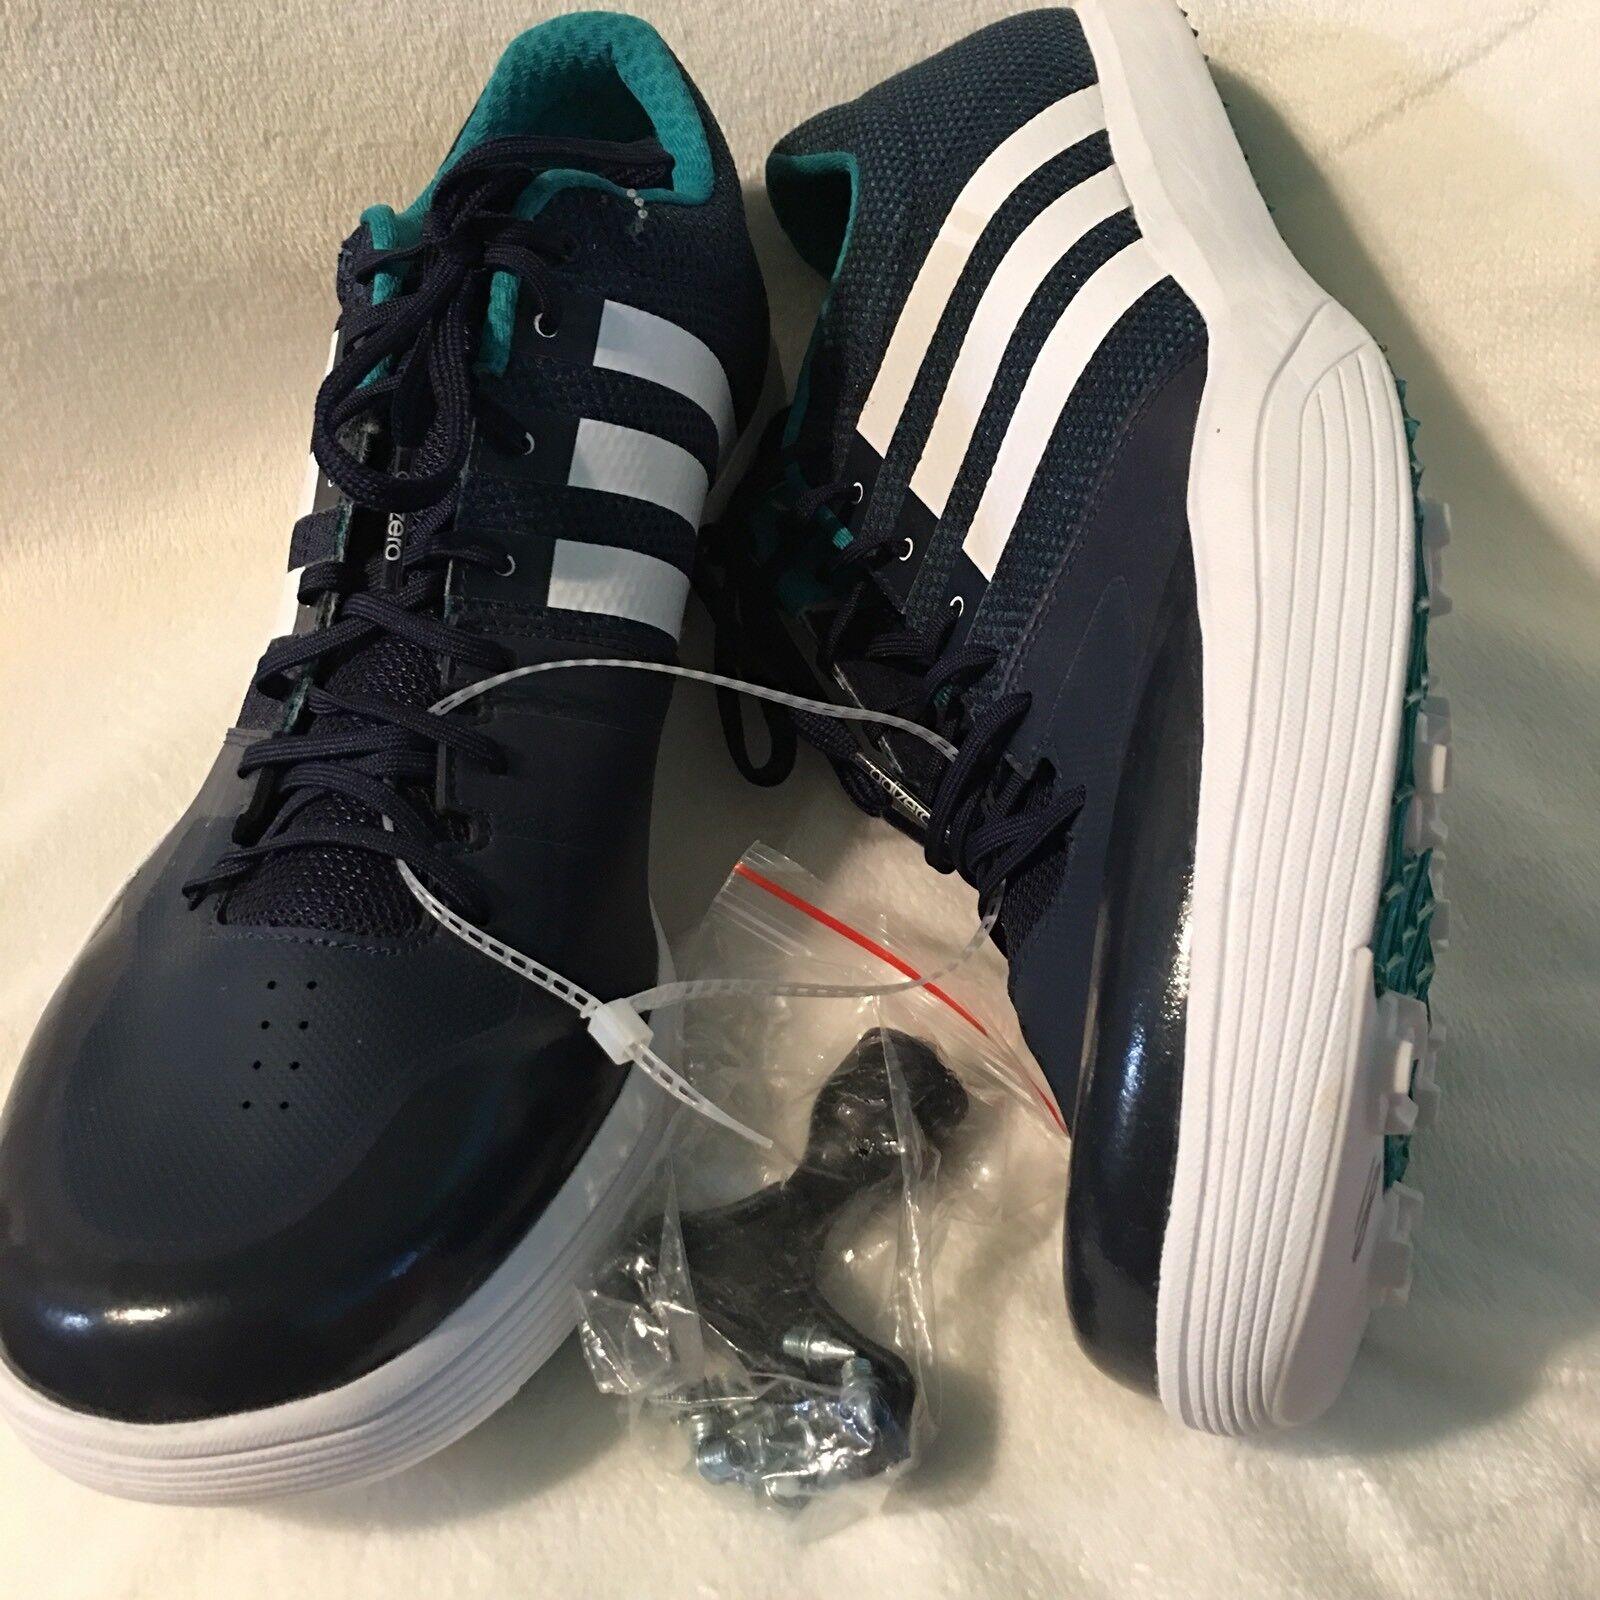 Adidas Men's Adizero Long Jump 2 Track & Field Shoes Comfortable Cheap and beautiful fashion